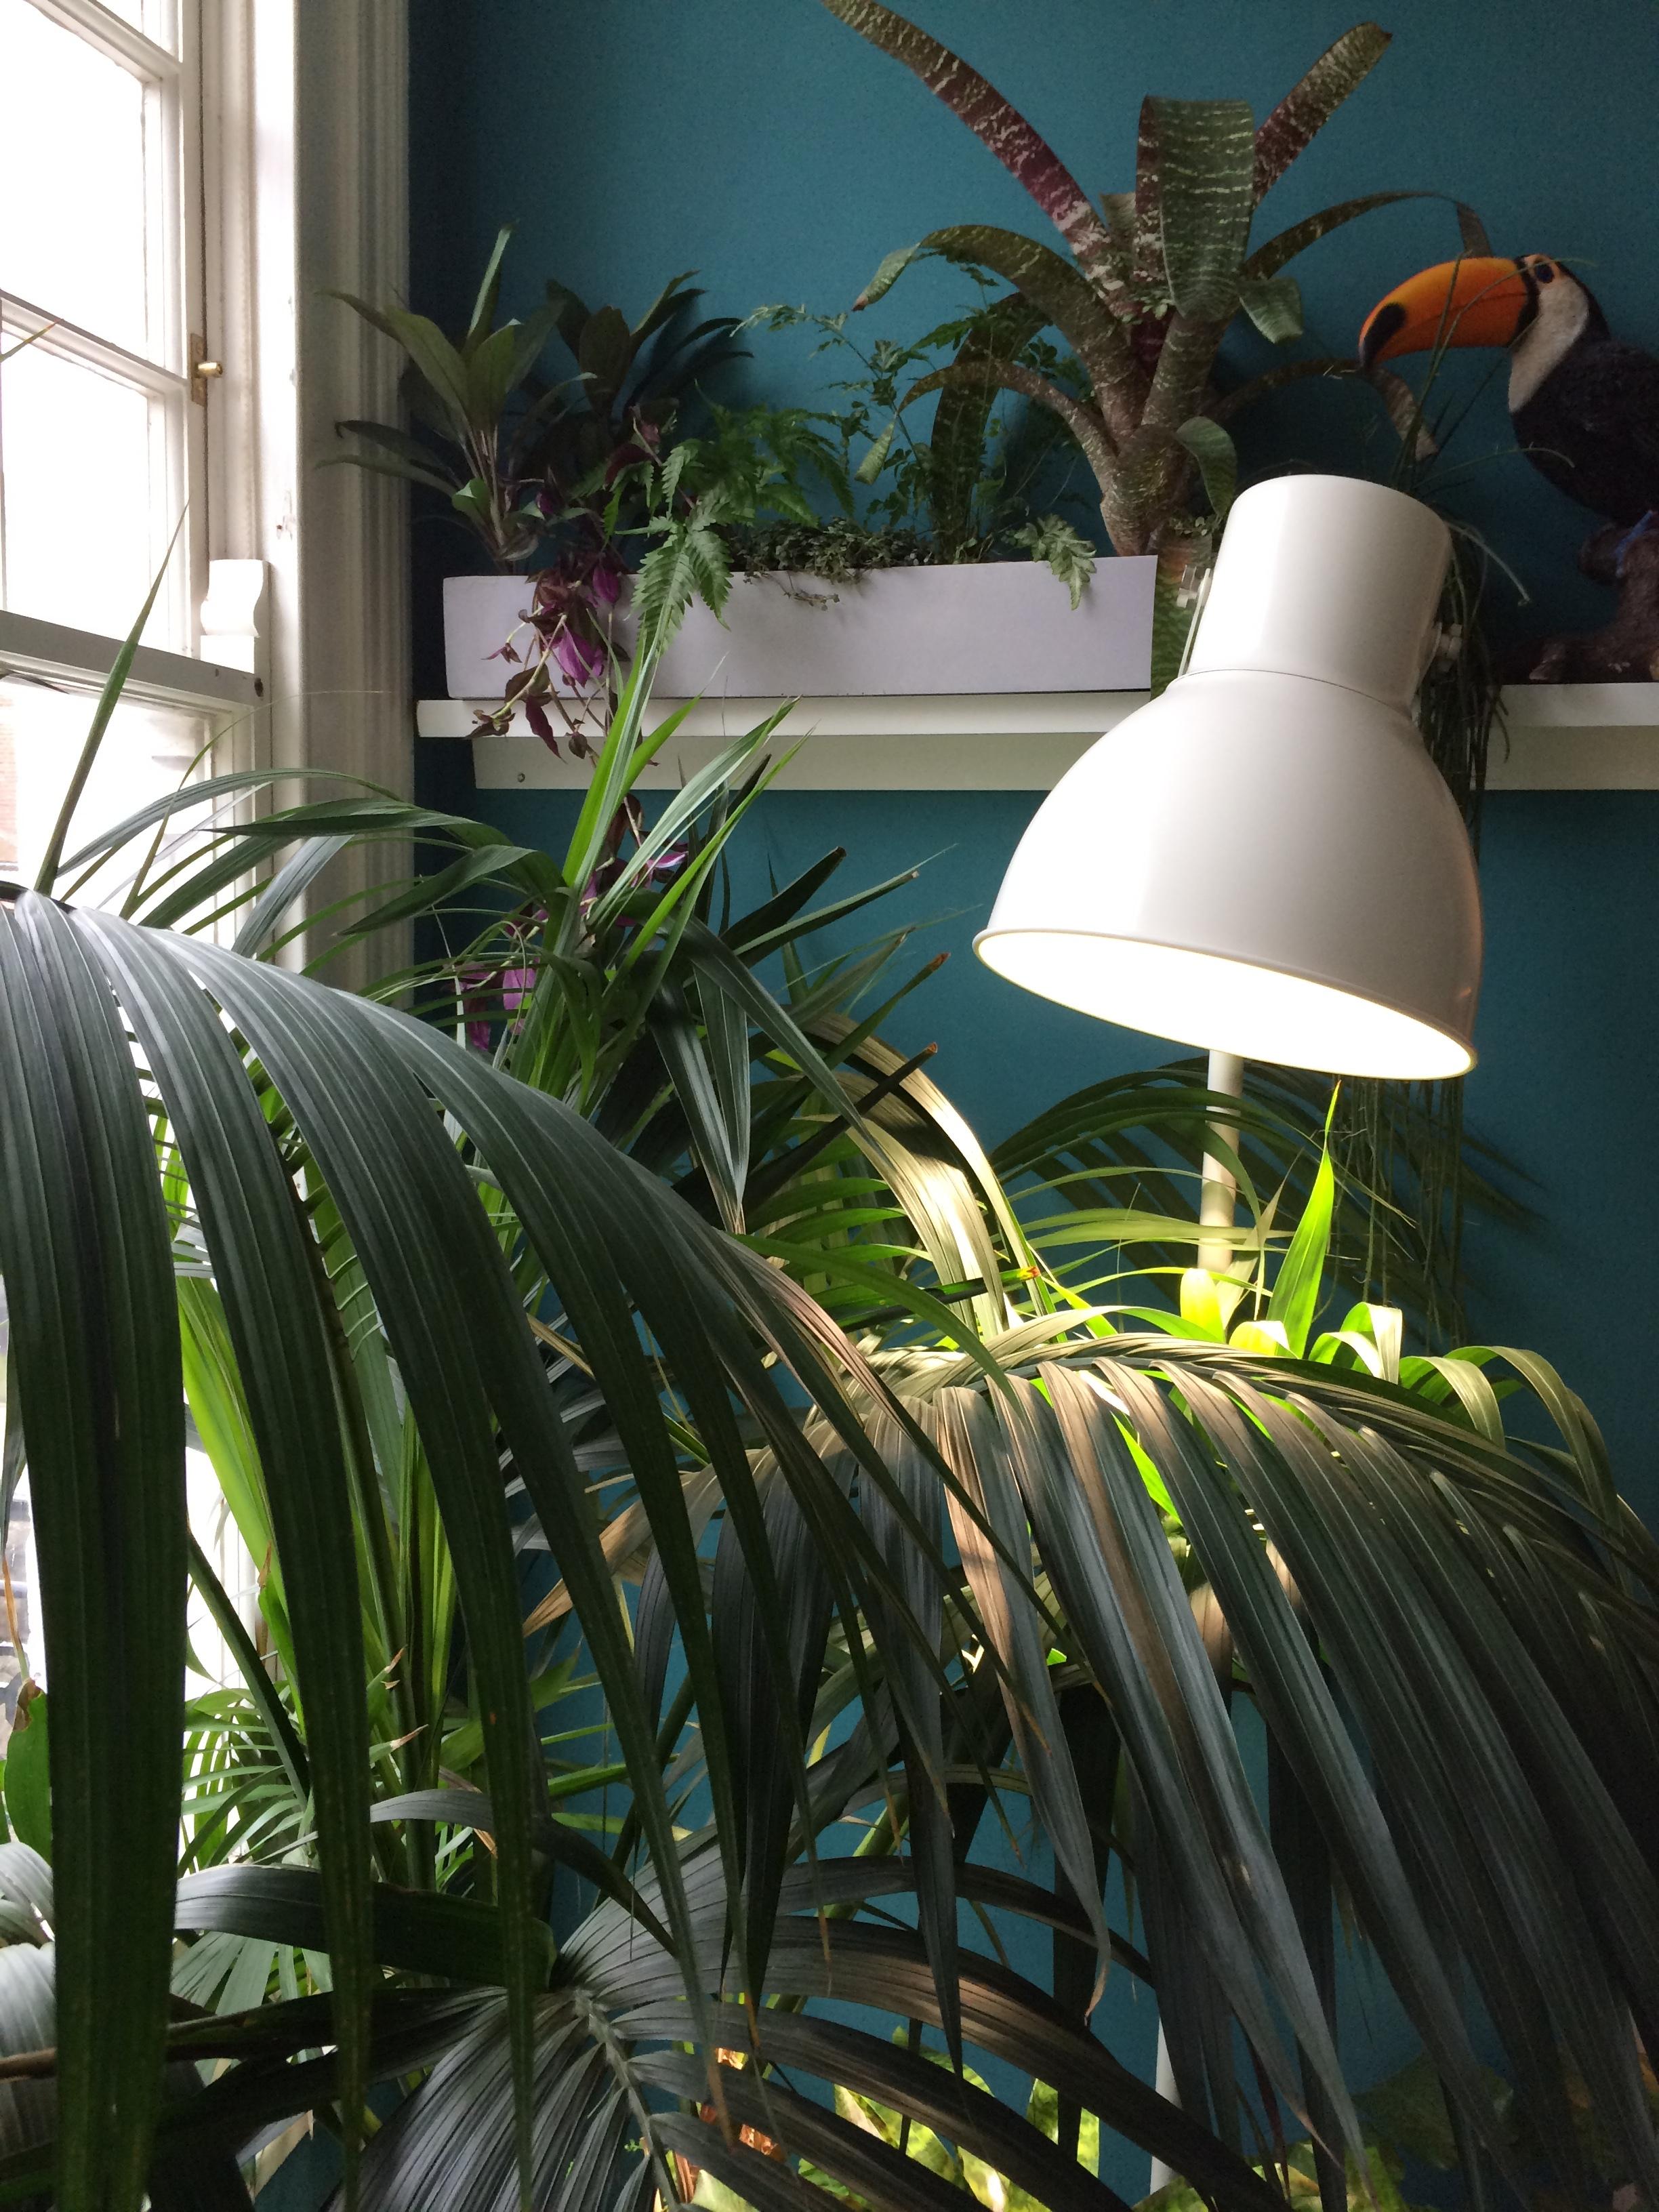 Kentia palm lit by an IKEA growlight